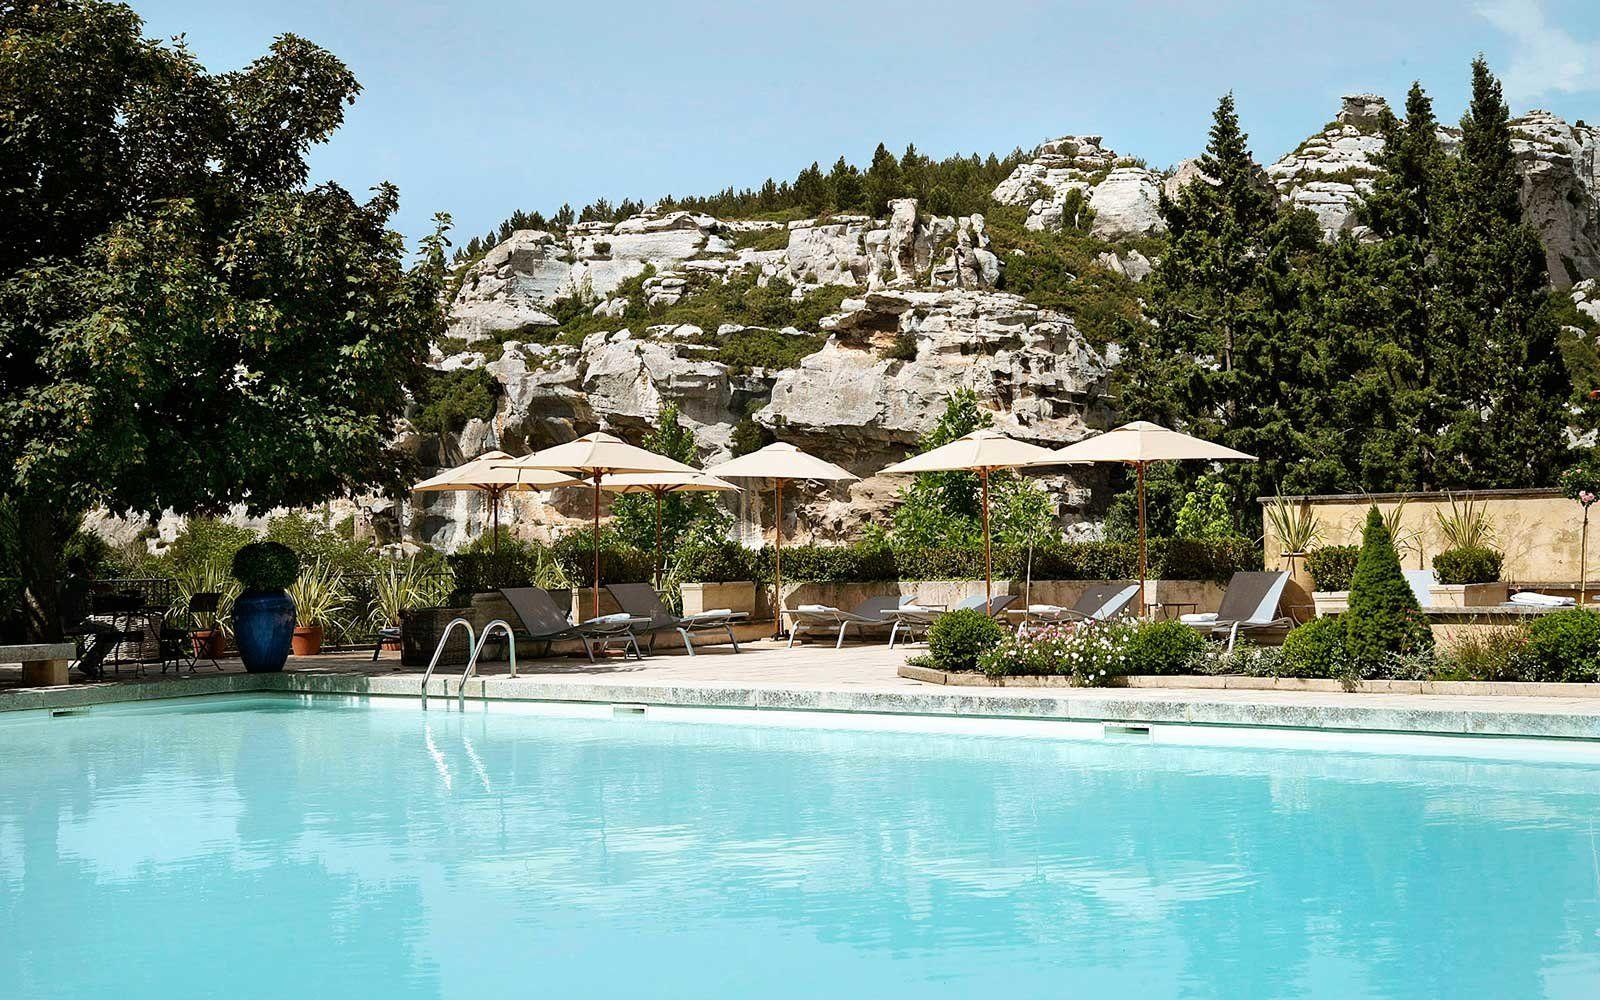 Resort Hotels In France World S Best 2019 Hotels In France